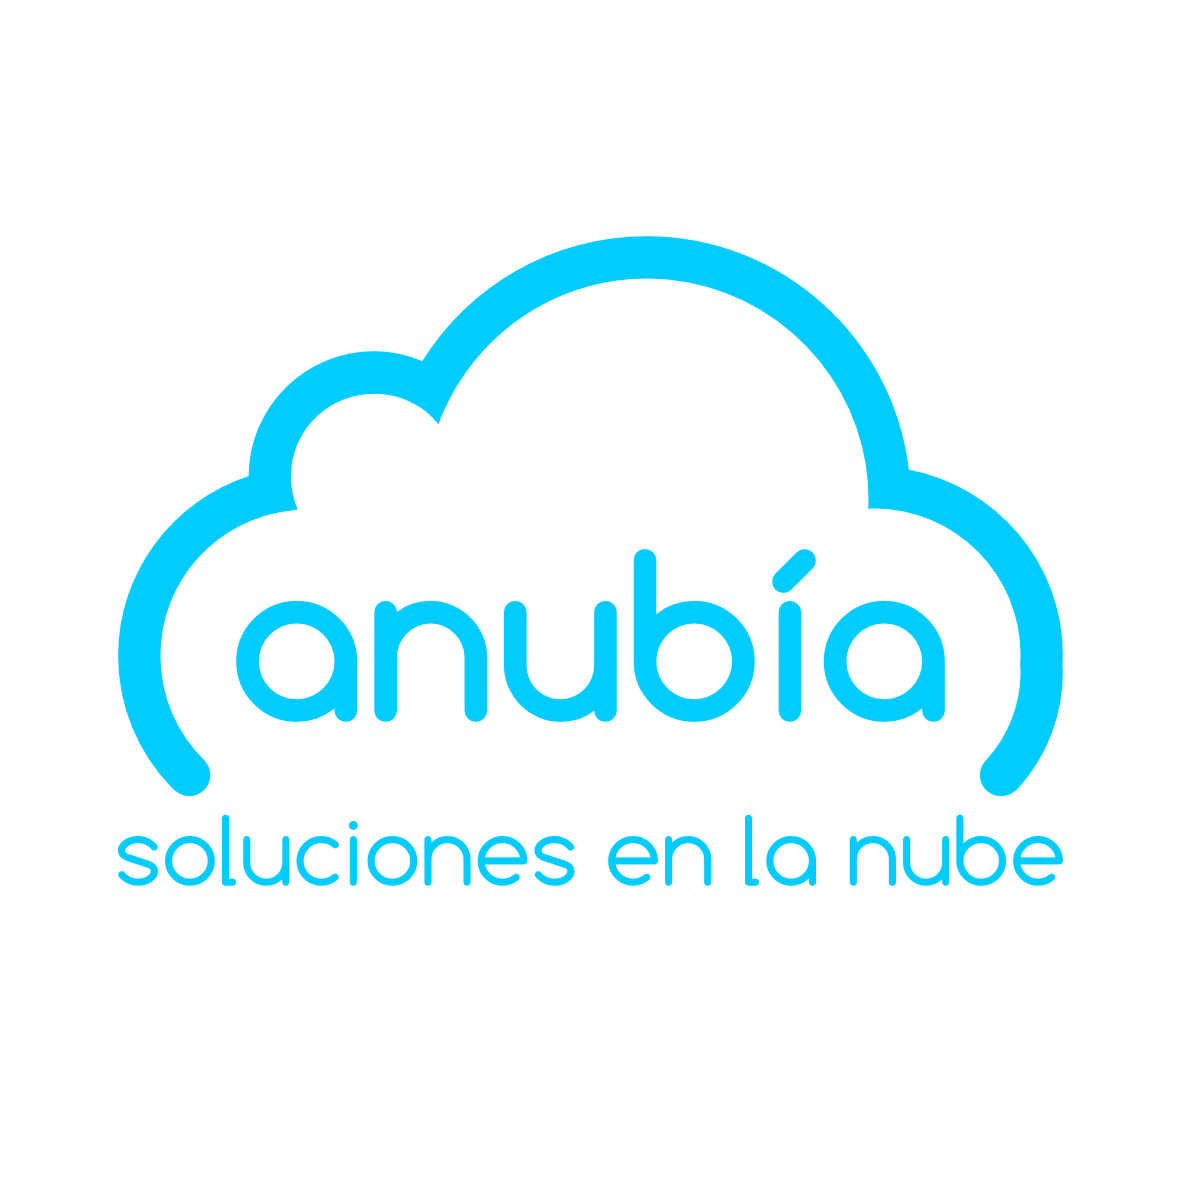 Anubia